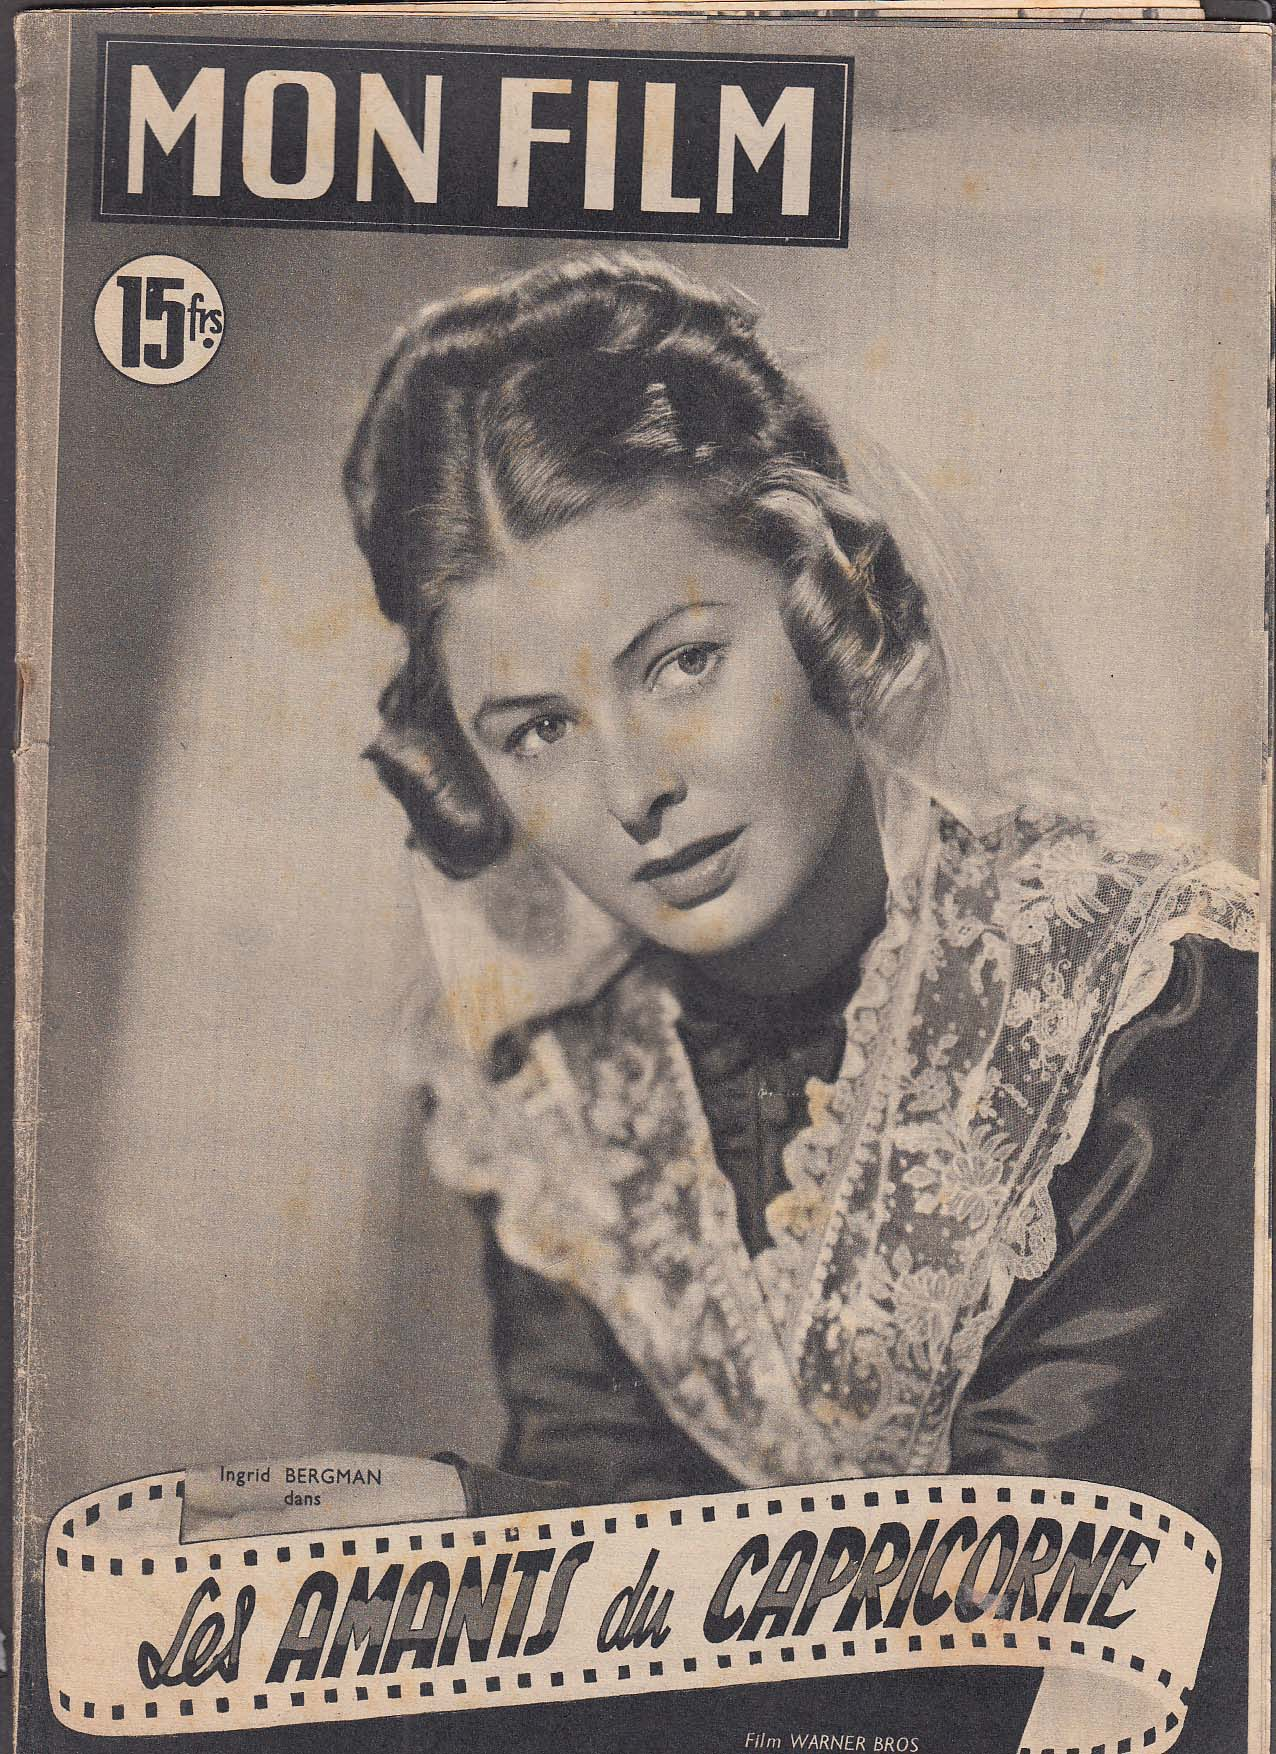 Image for MON FILM Ingrid Bergman Under Capricorn Joseph Cotten 12 1950